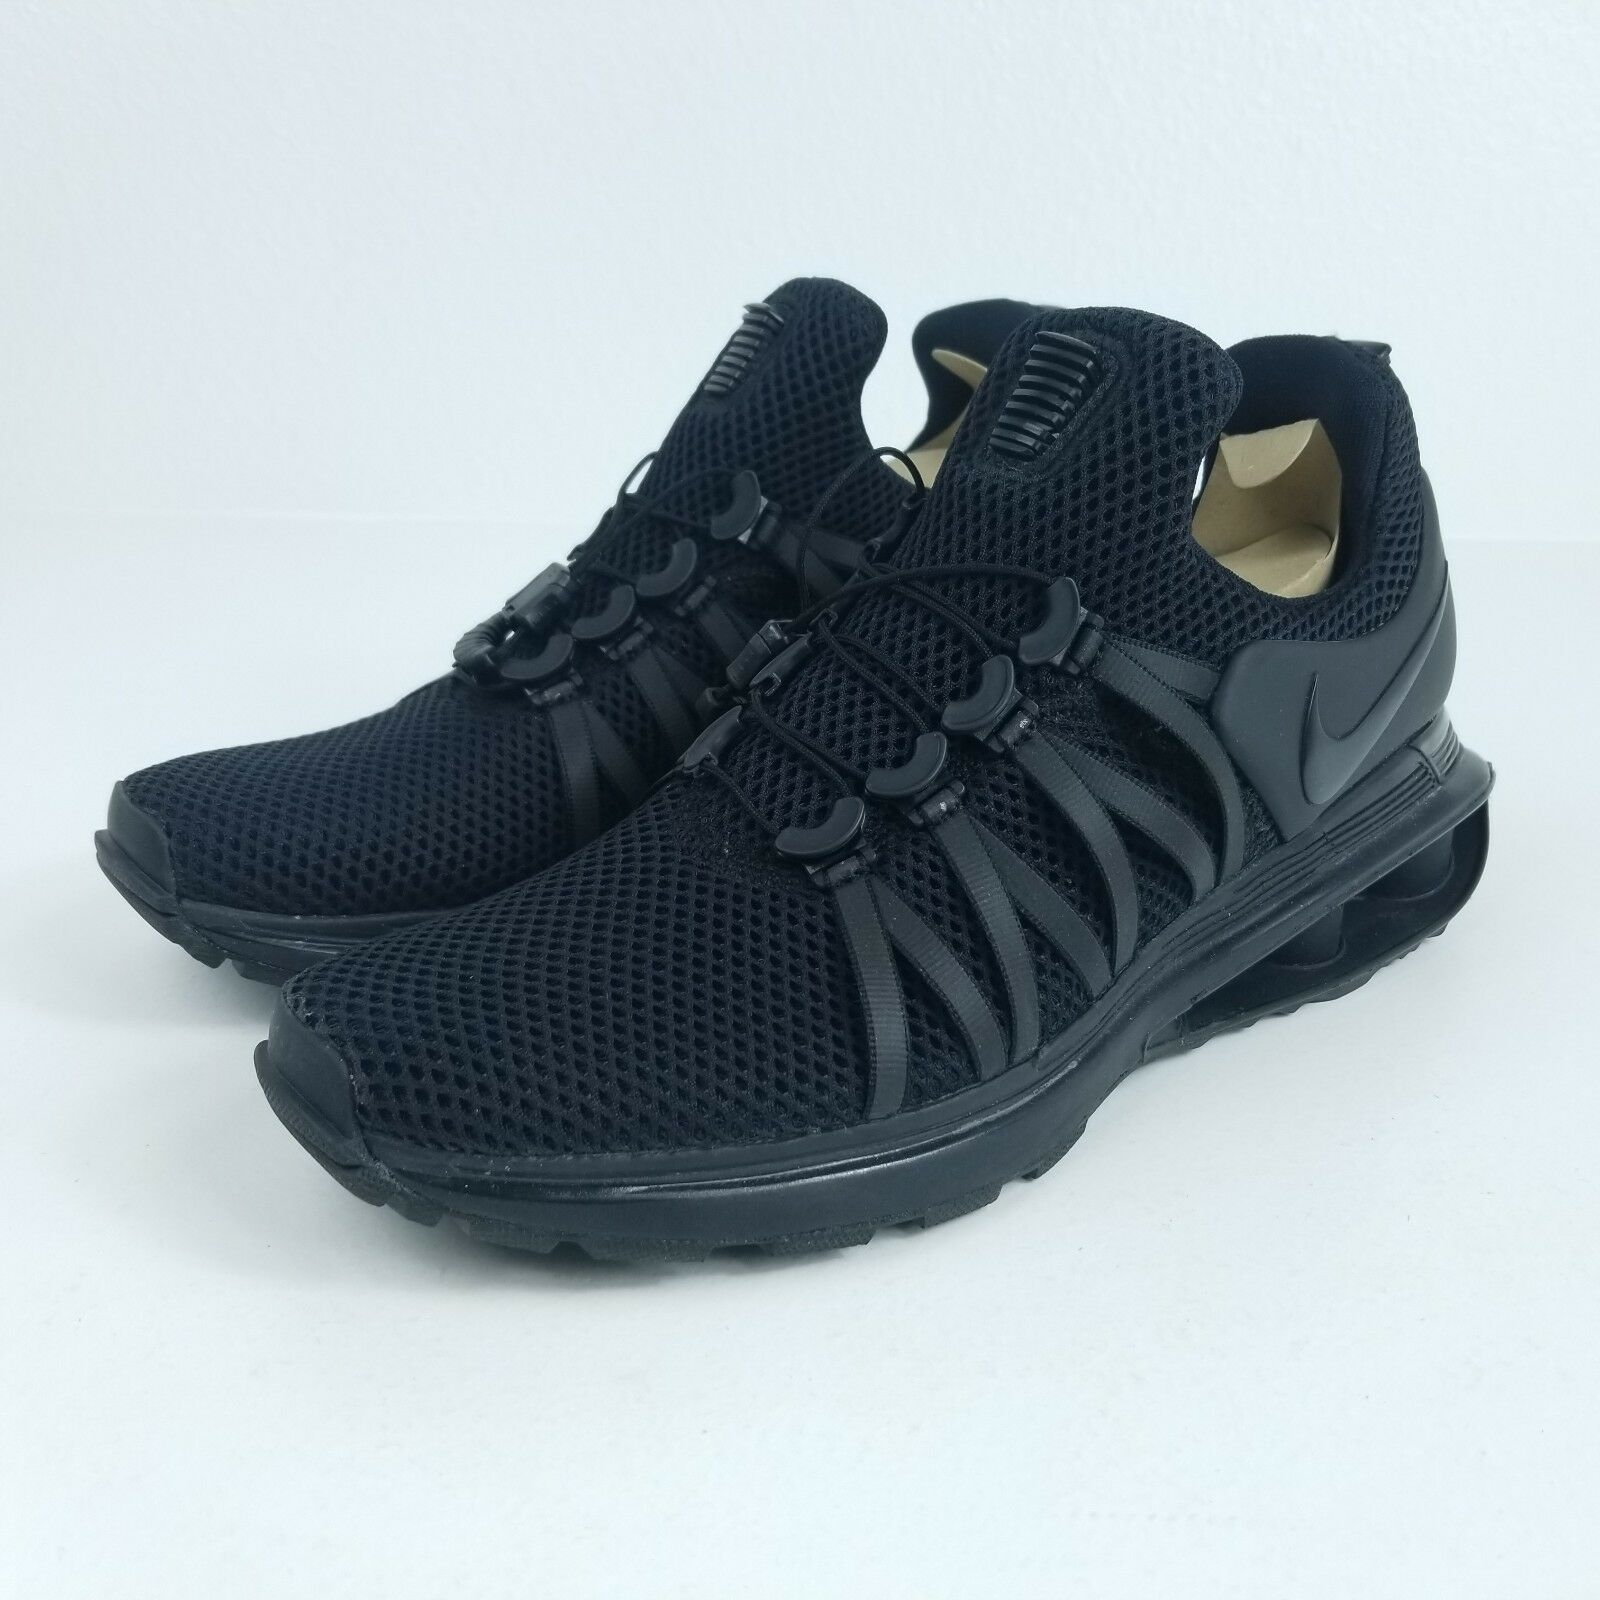 Nike shox gravità Uomo sz 9 scarpe nere ar1999 001